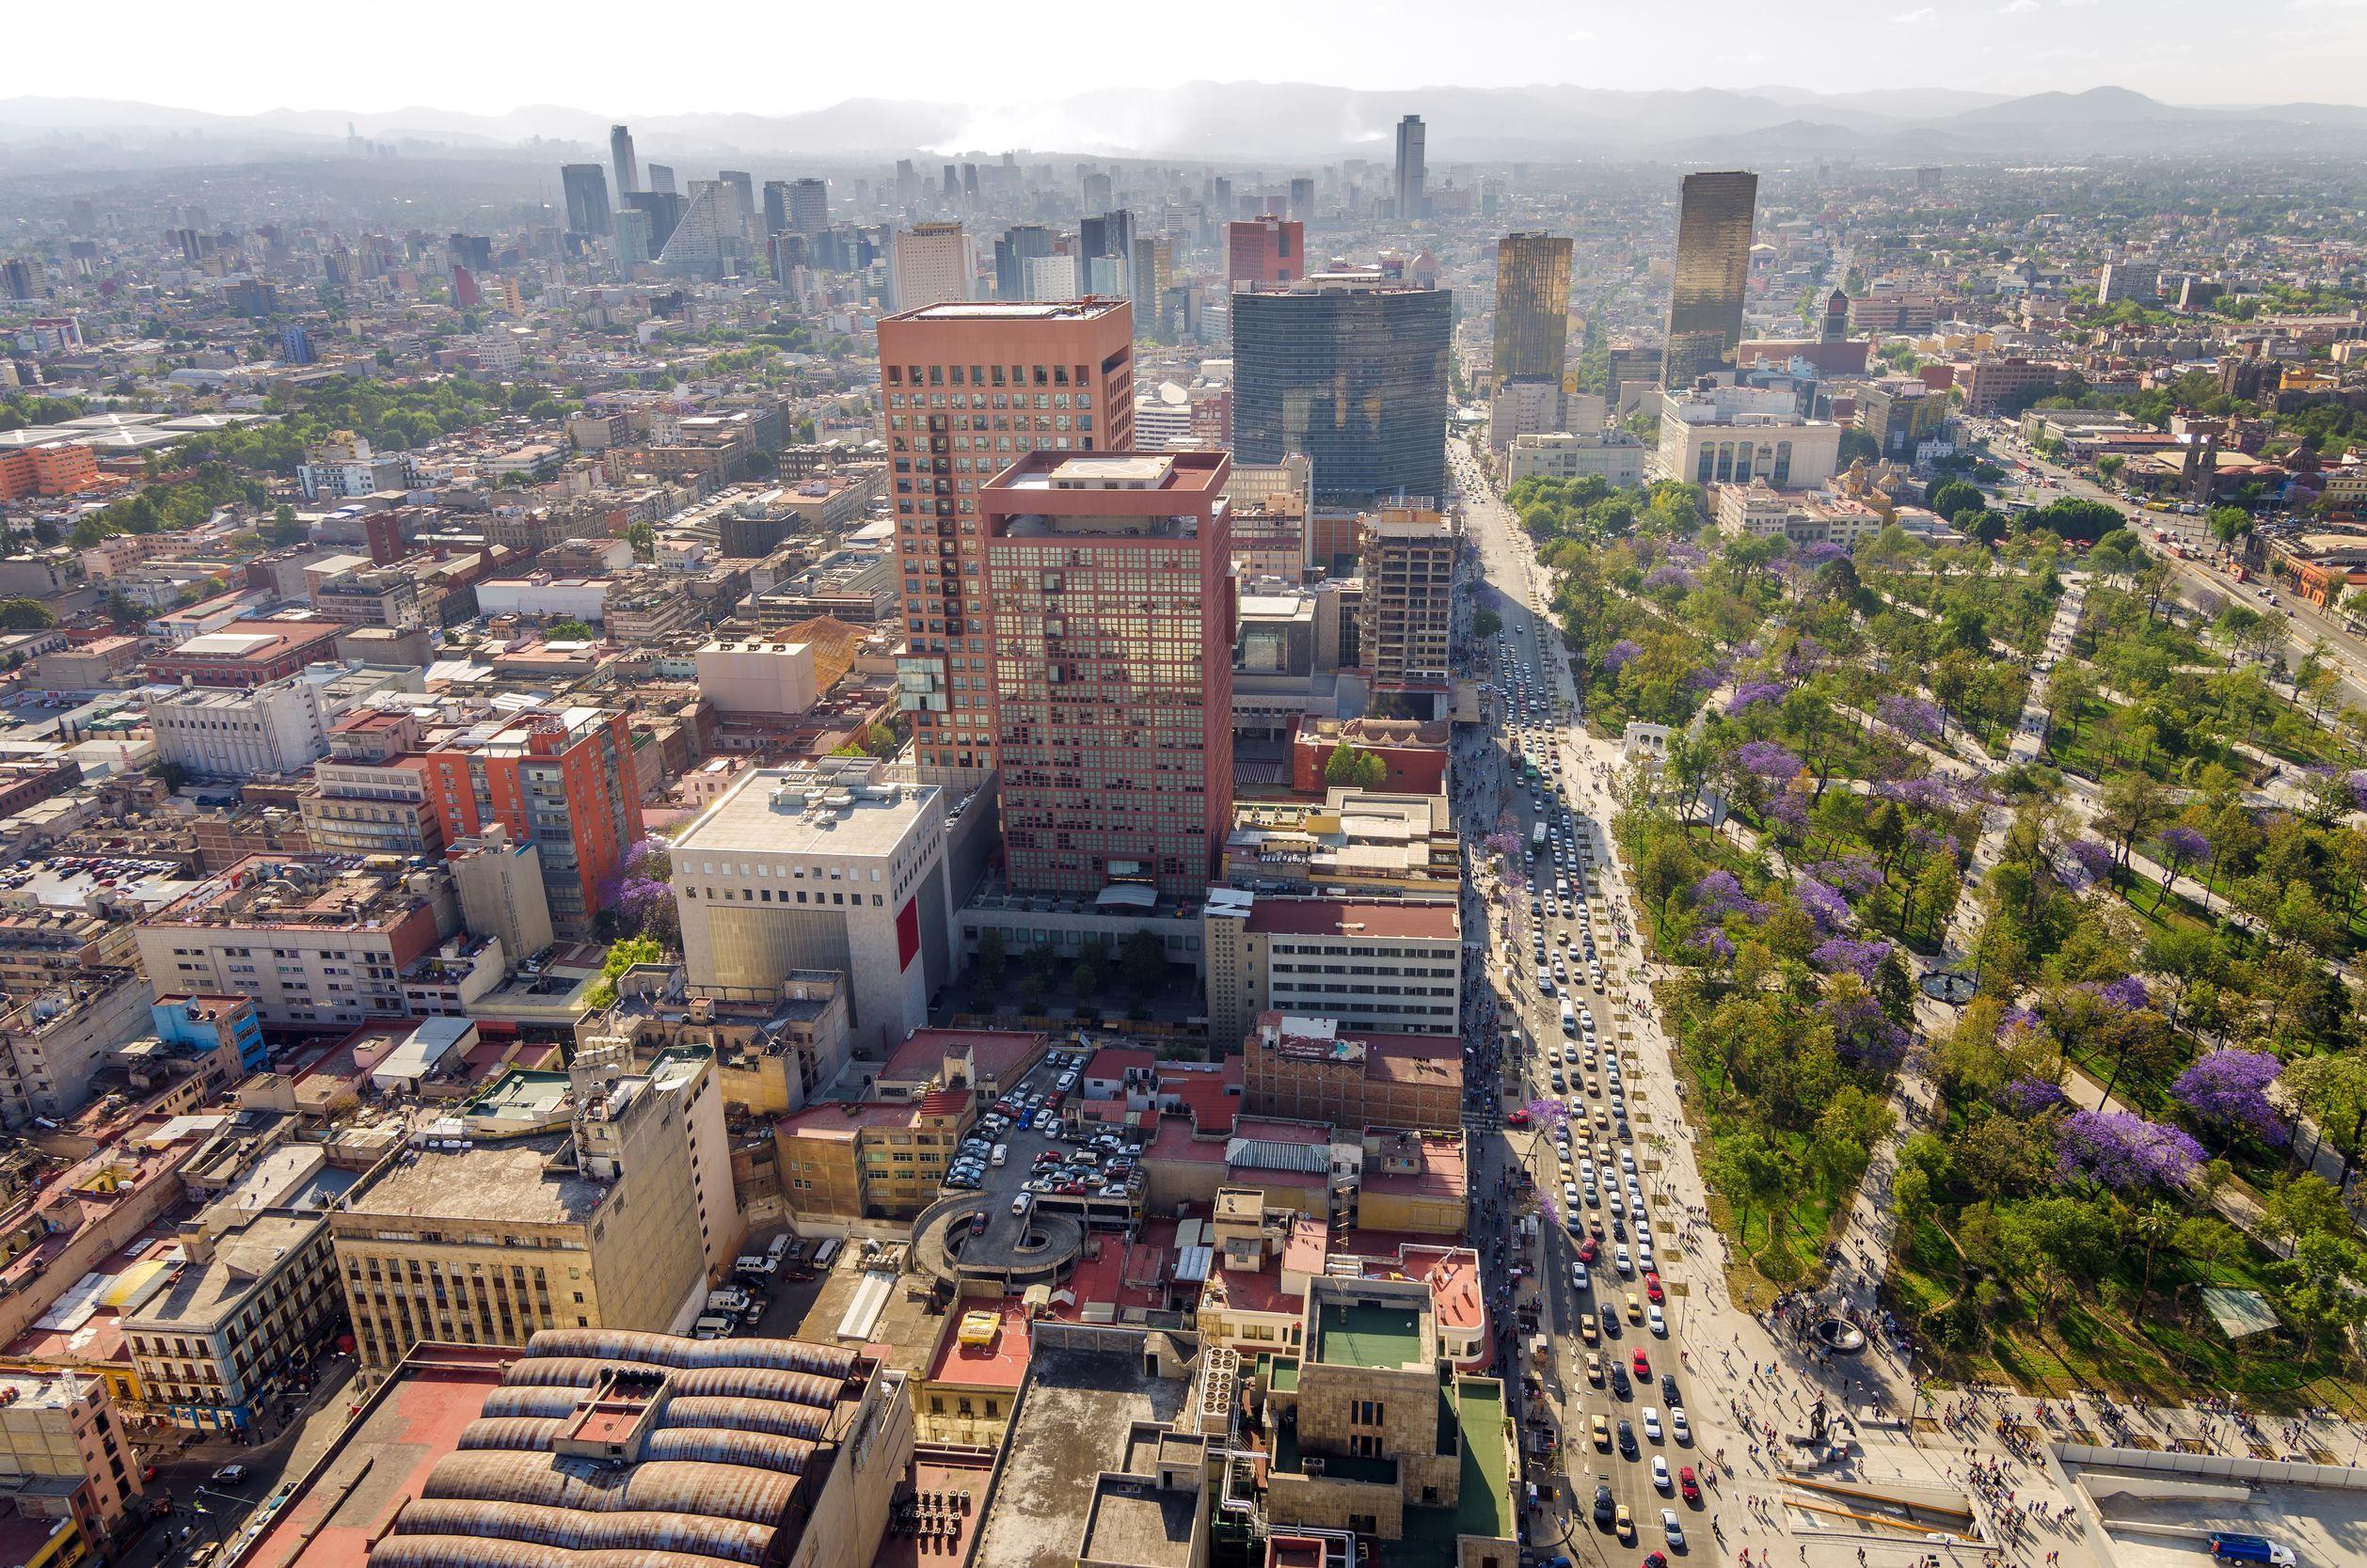 Panoráma města Mexico City | jkraft5/123RF.com